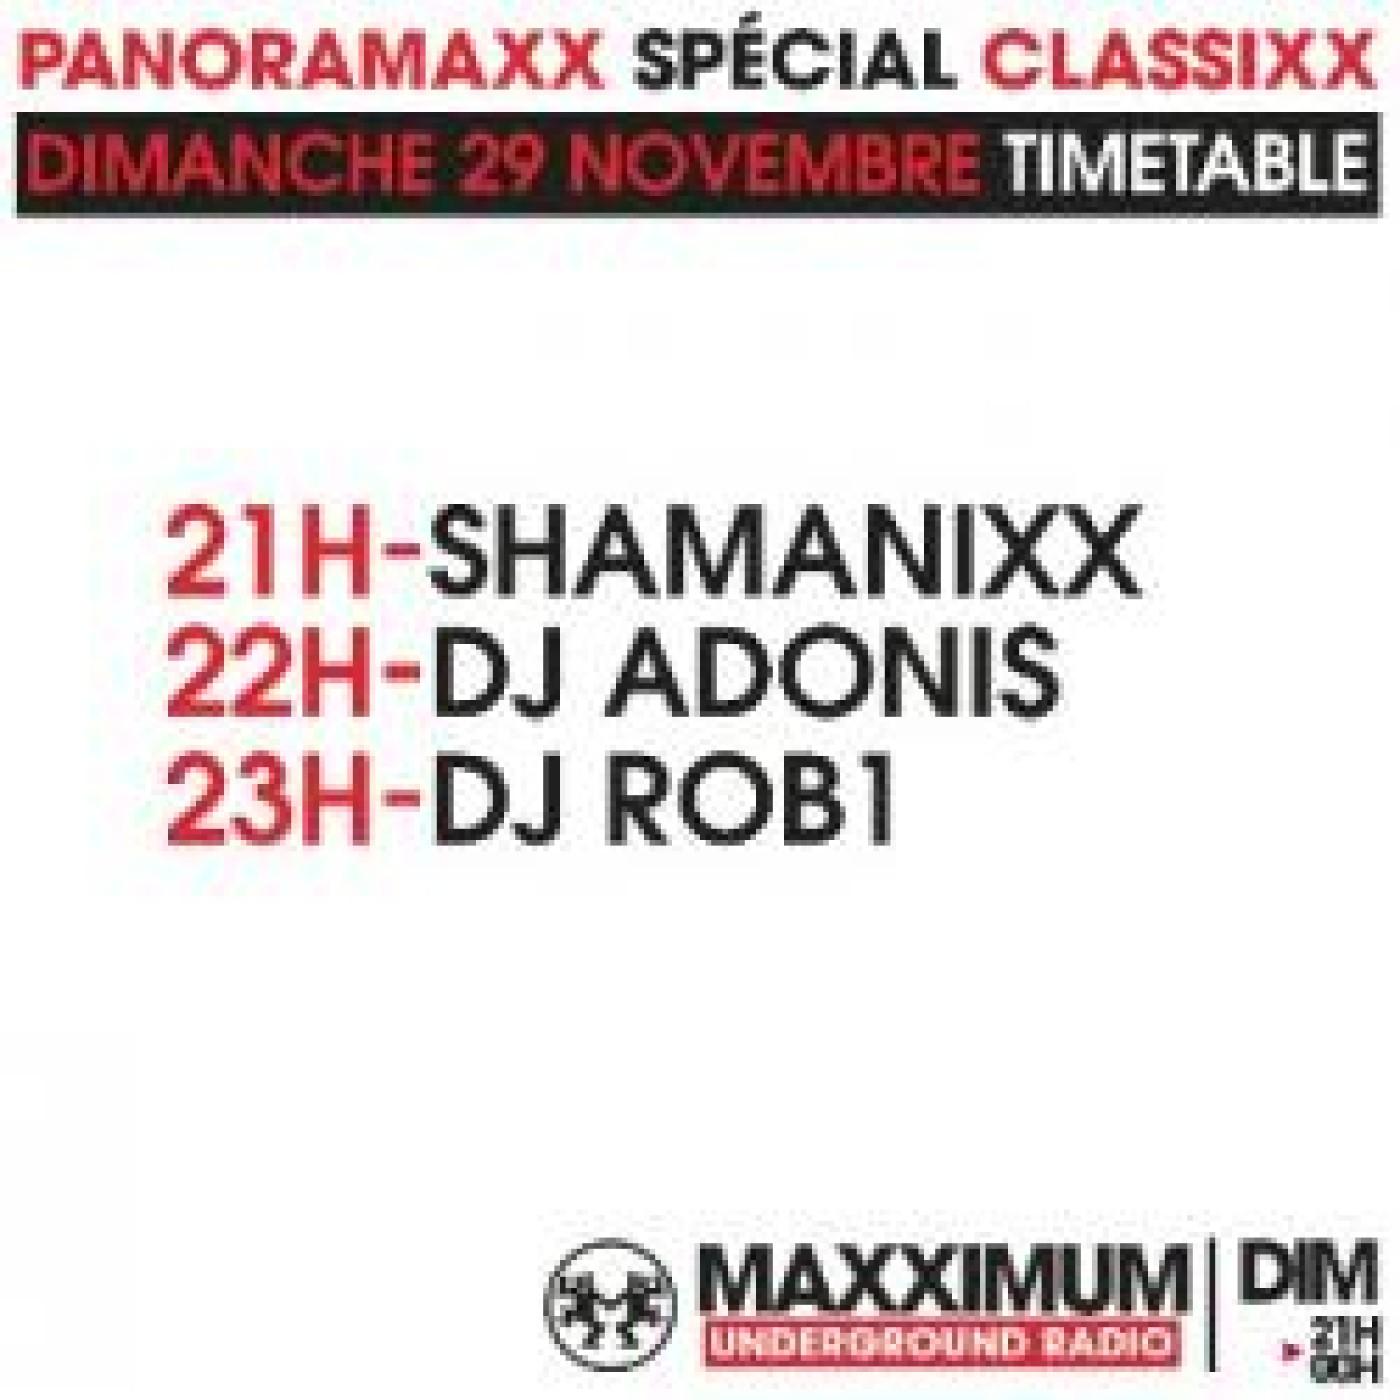 PANORAMAXX CLASSIXX : DJ ROB1